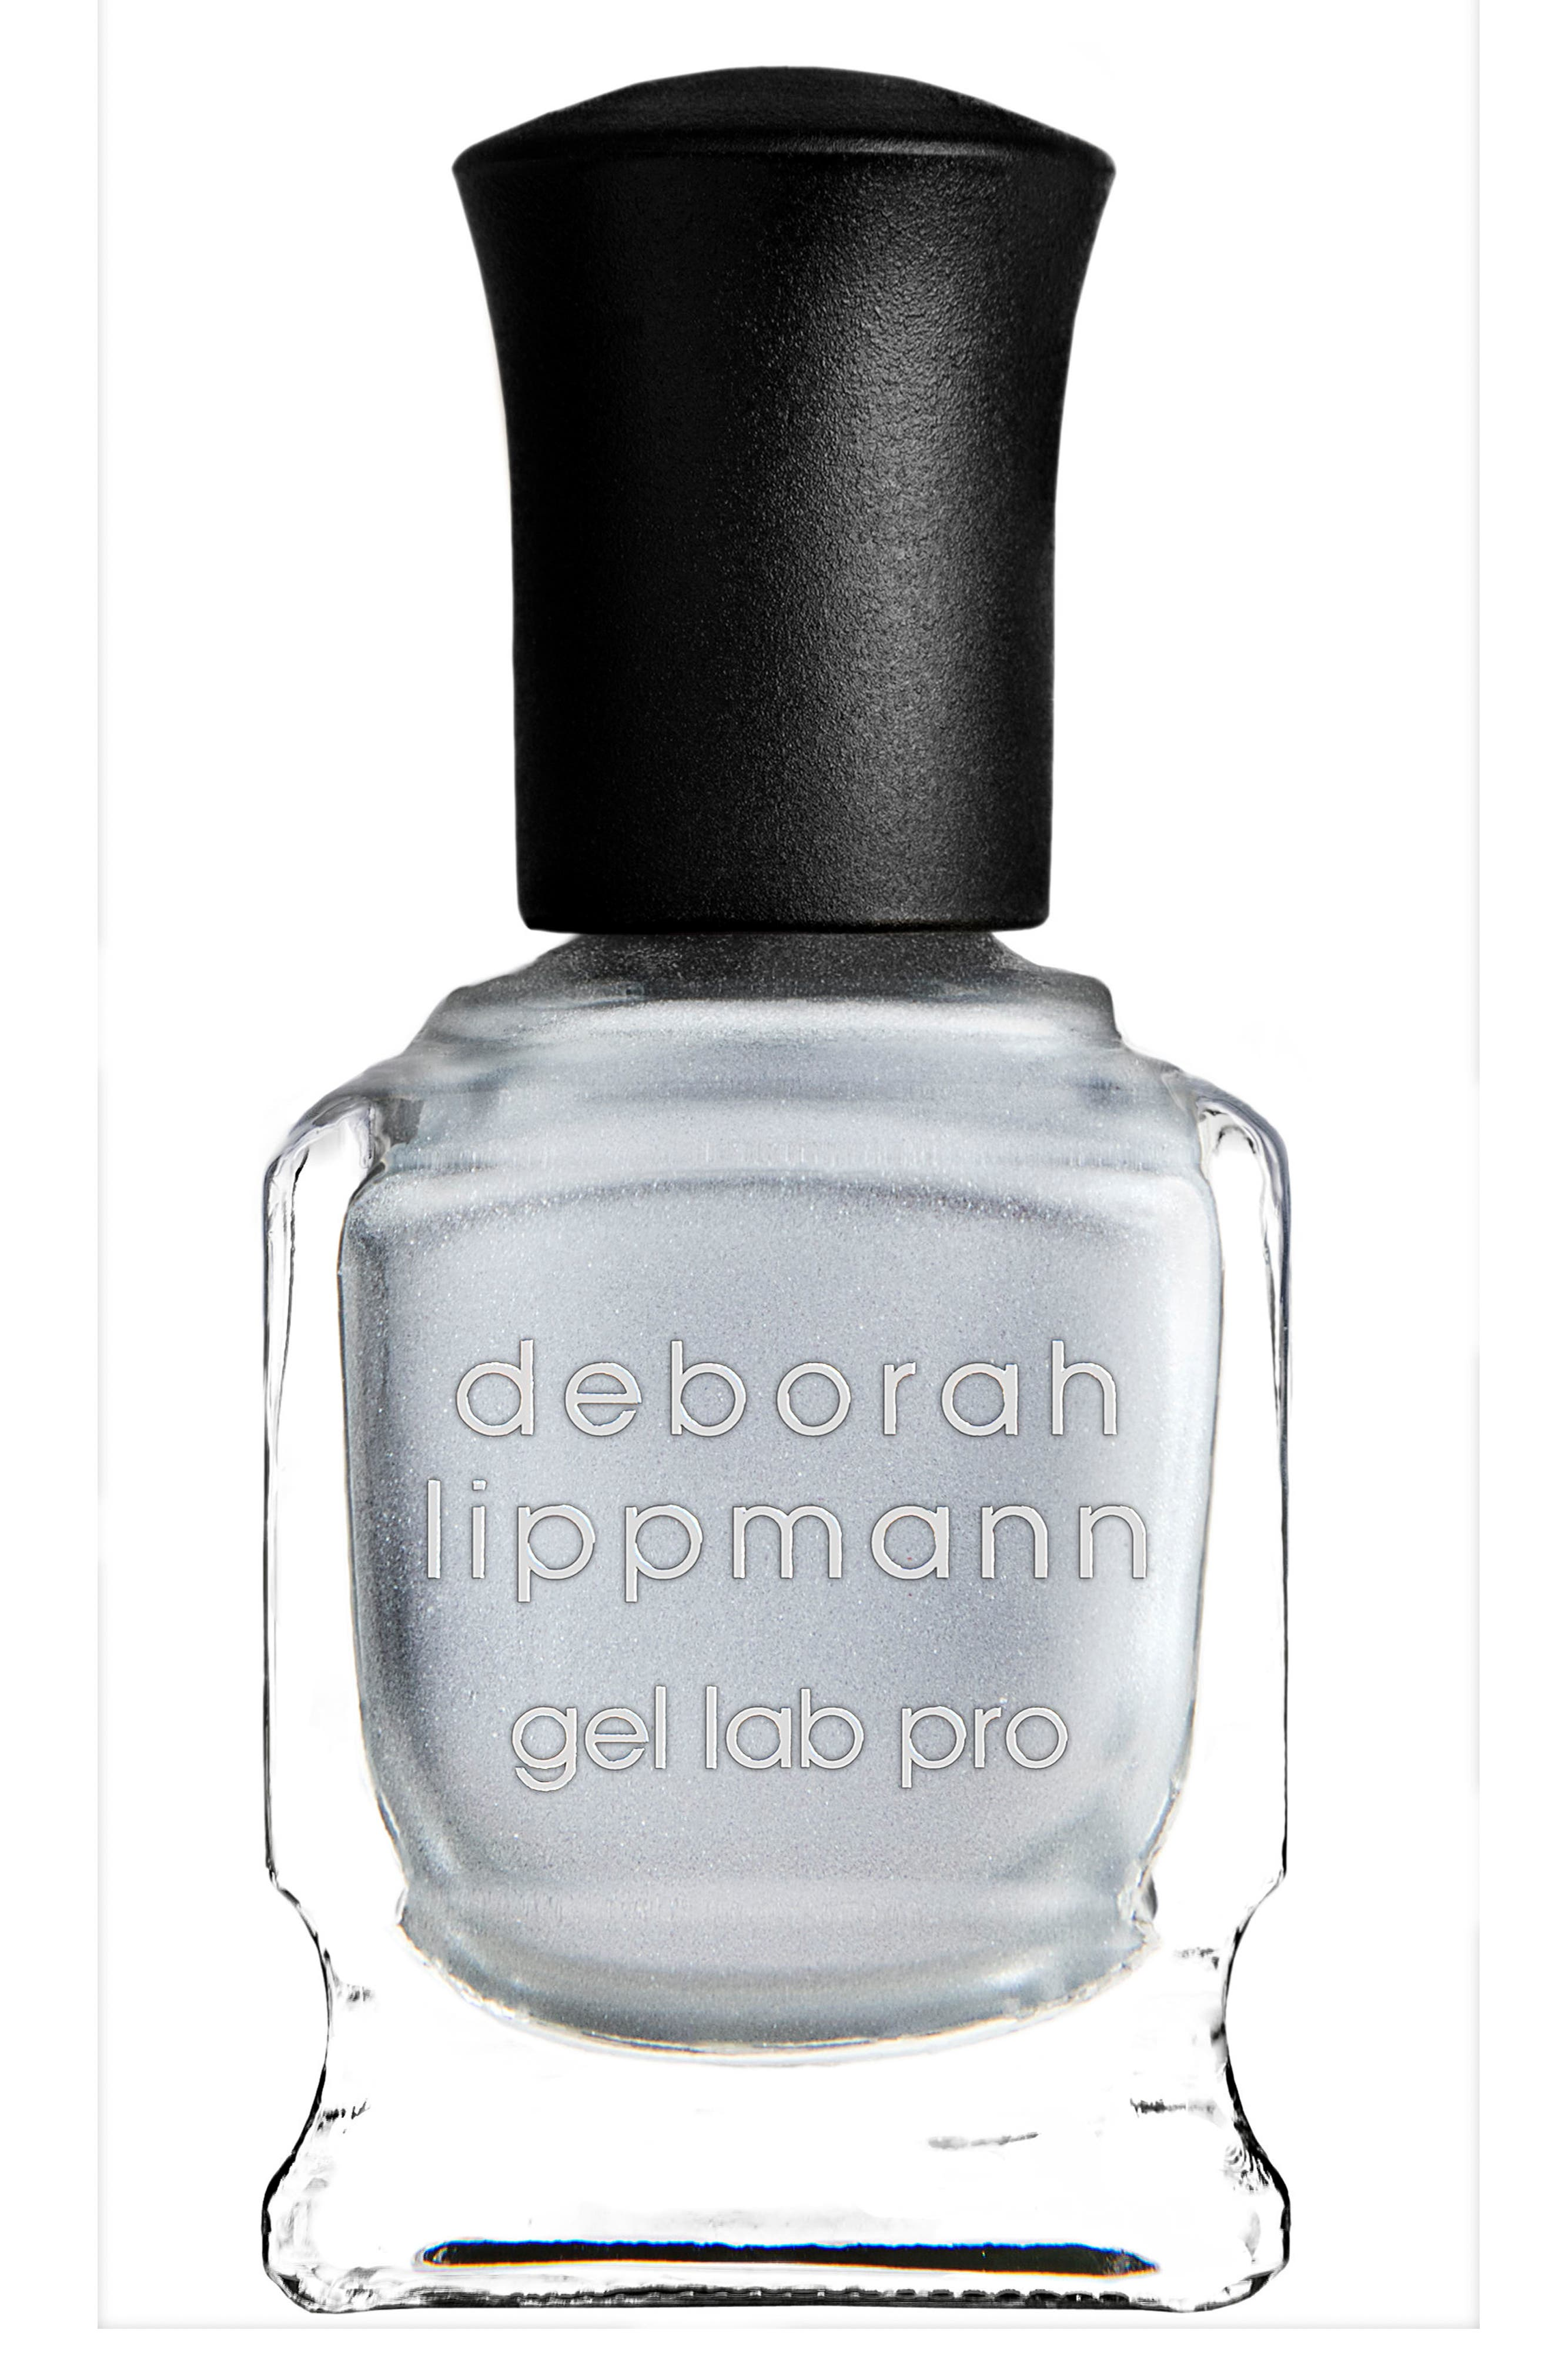 Deborah Lippmann Gel Lab Pro - Star Power Collection Nail Color